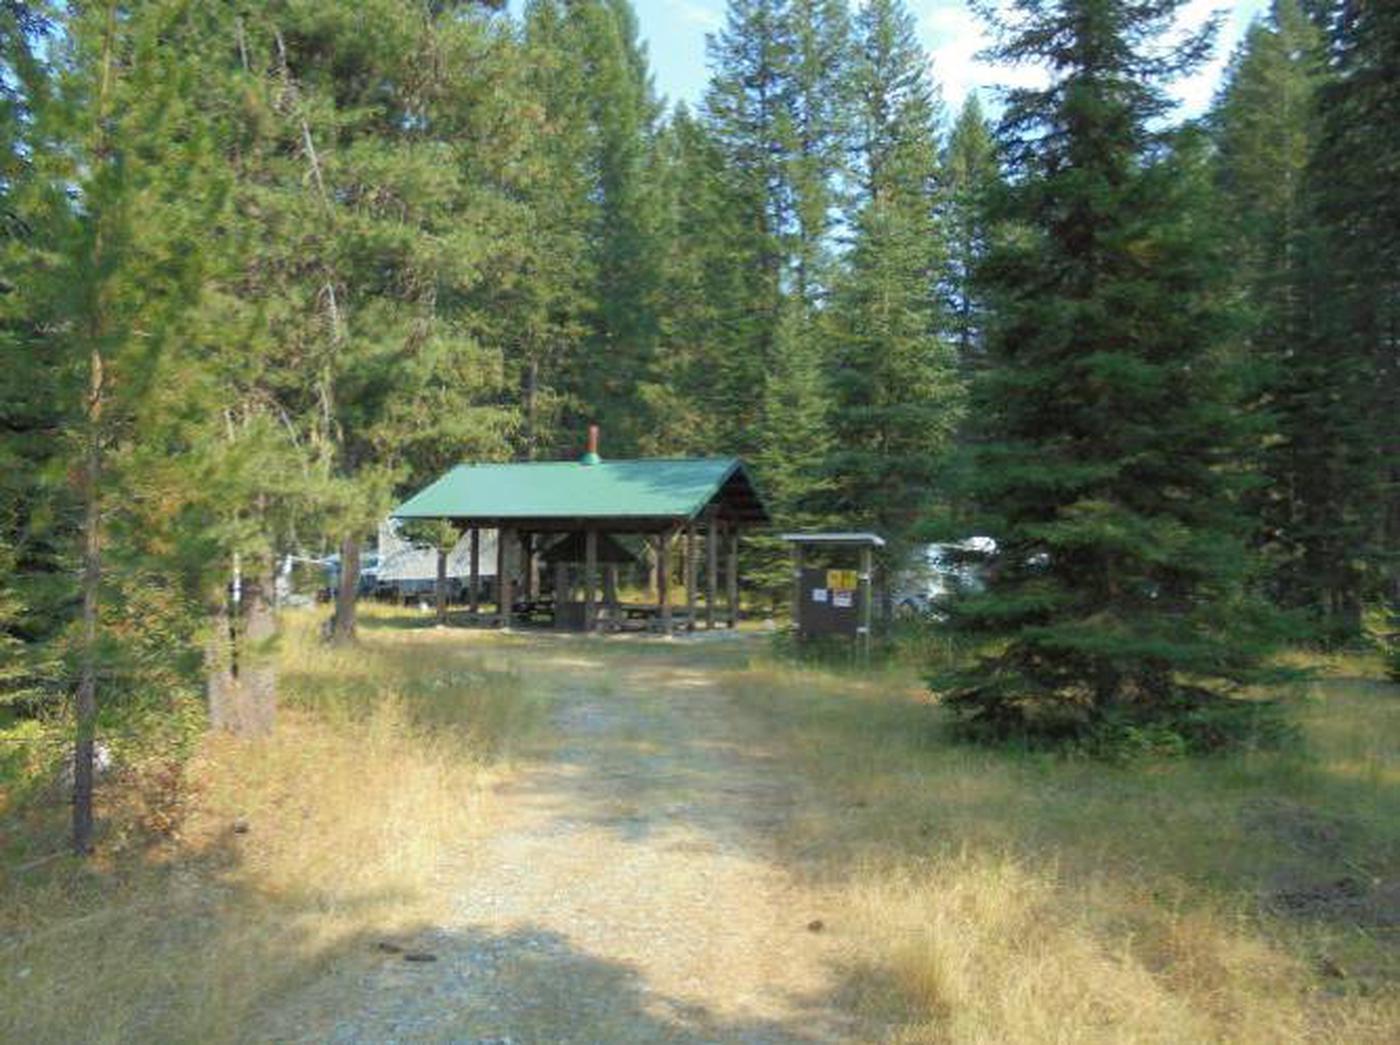 Reynolds Creek Group Camp near Priest Lake, Idaho 2Reynolds Creek Group Camp near Priest Lake, Idaho